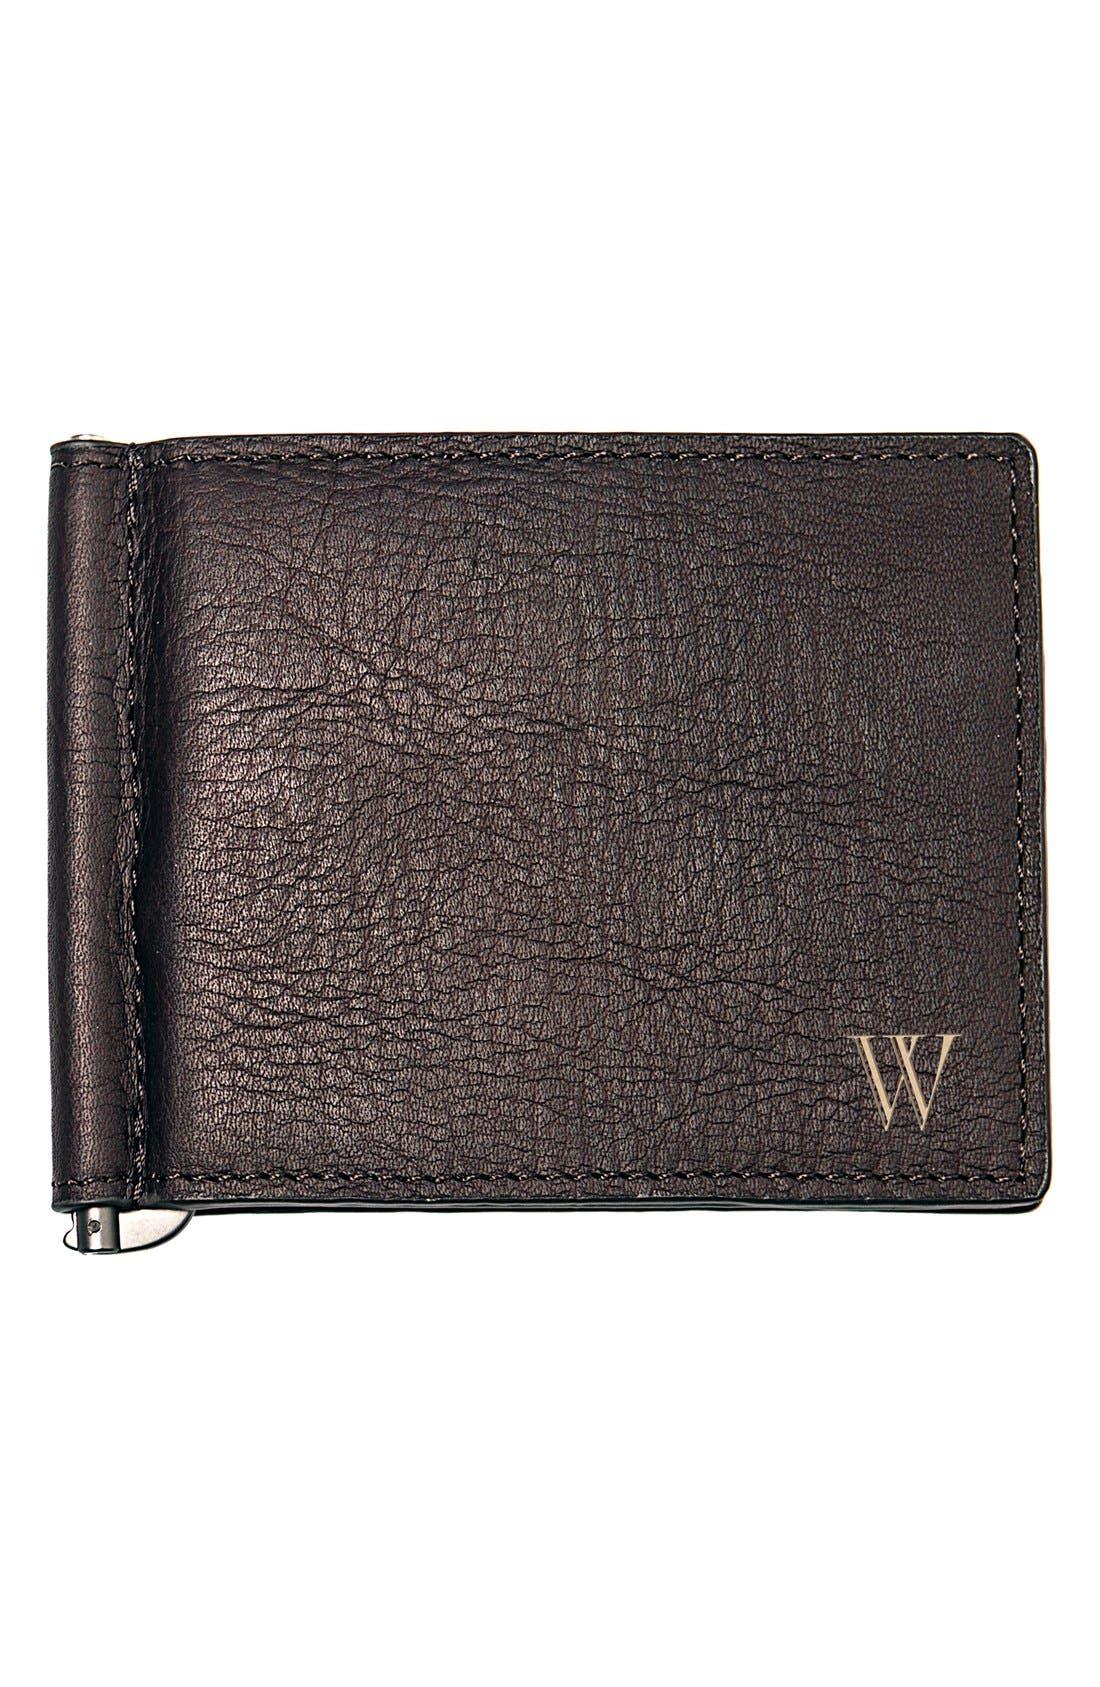 Monogram Leather Wallet & Money Clip,                         Main,                         color, Brown - W